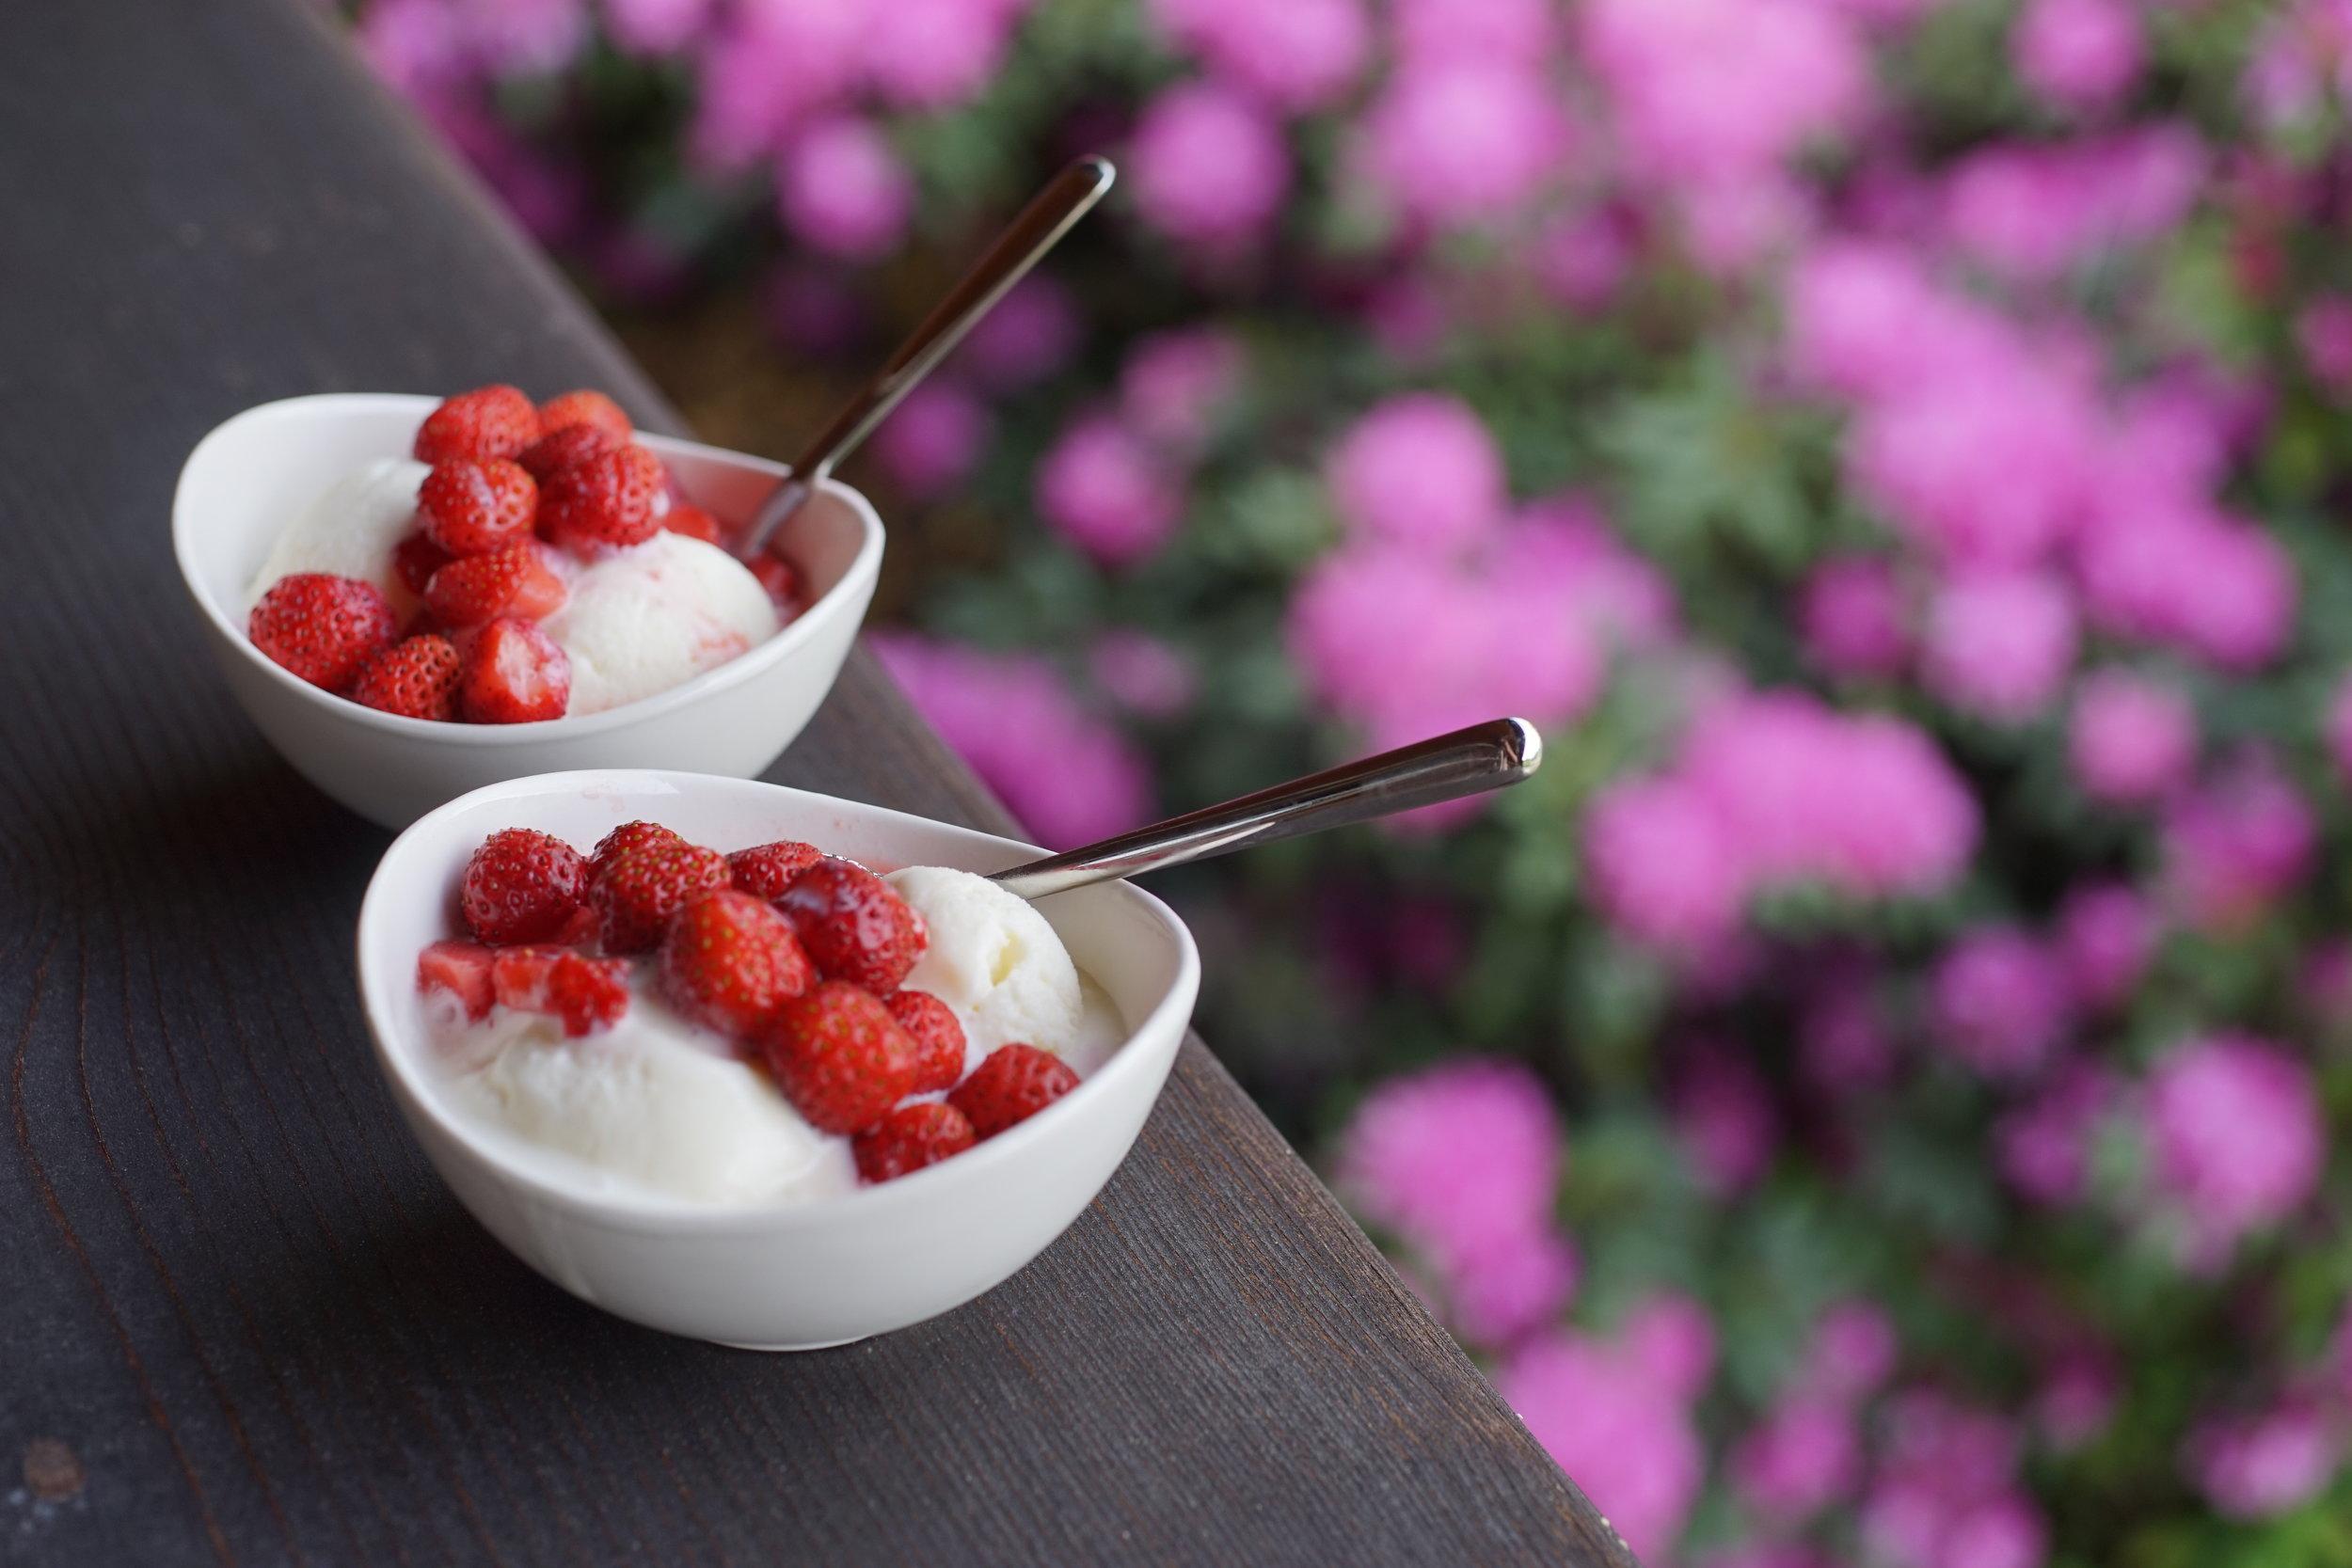 Another summer dessert? - Coupe Romanoff